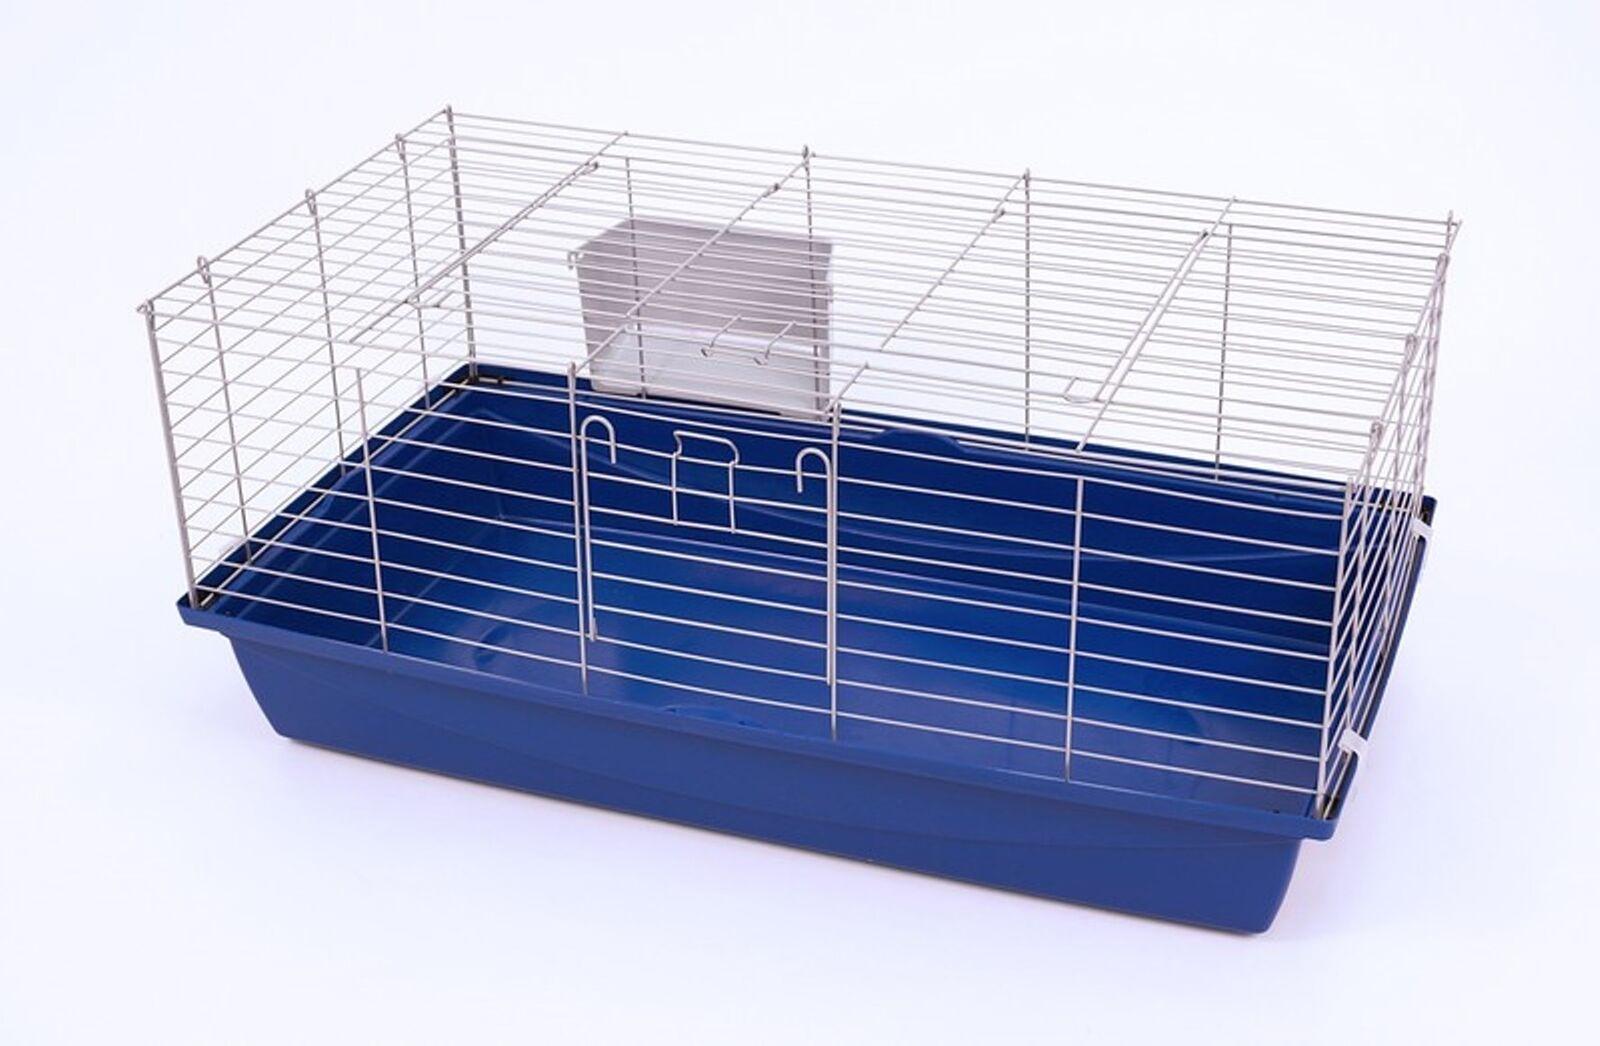 XXL cages de Hamster Cage a lapins rongeur 1,20m